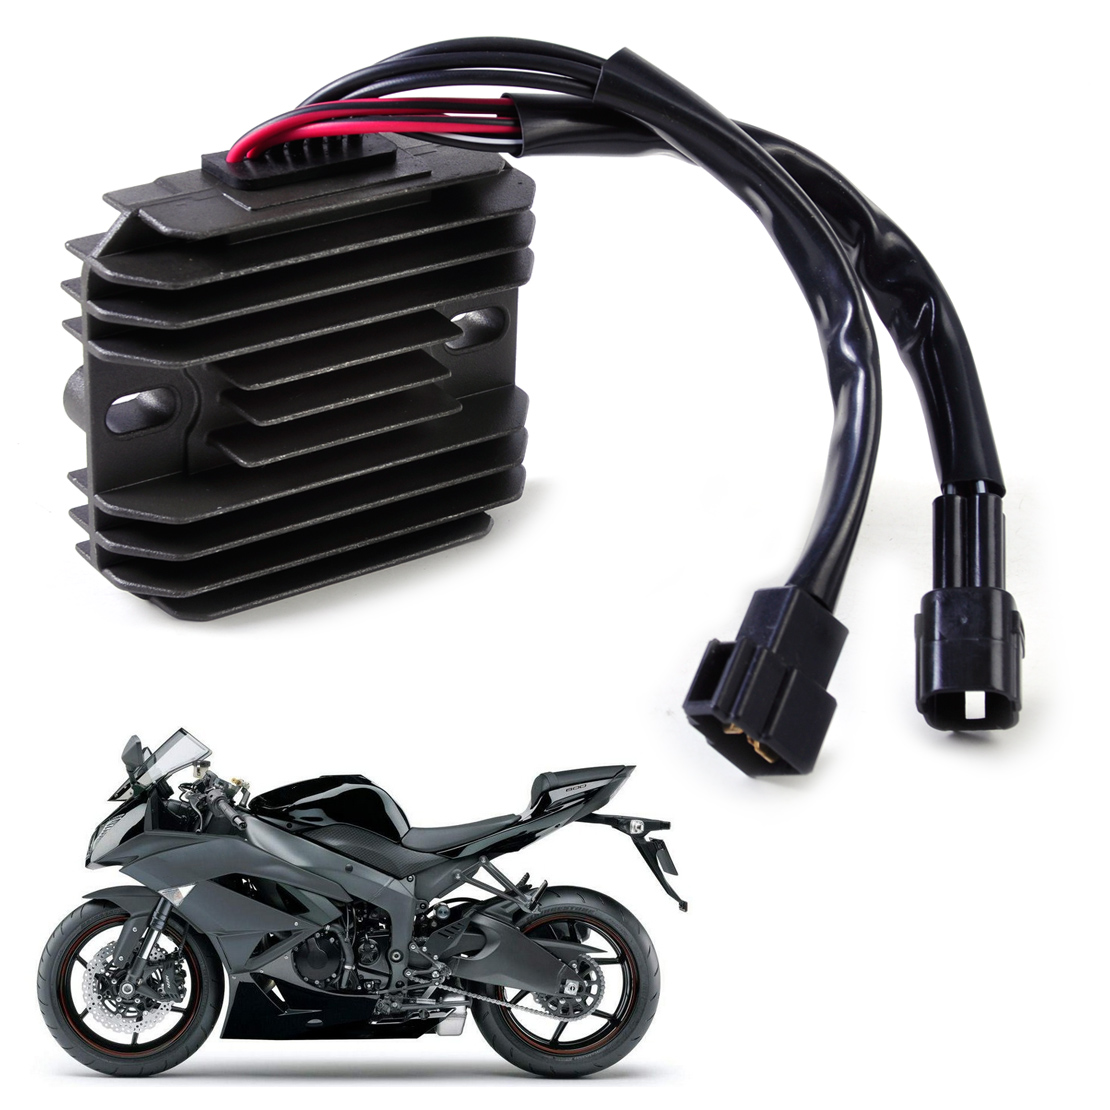 Citall Motorcycle Voltage Rectifier Regulator Fit For